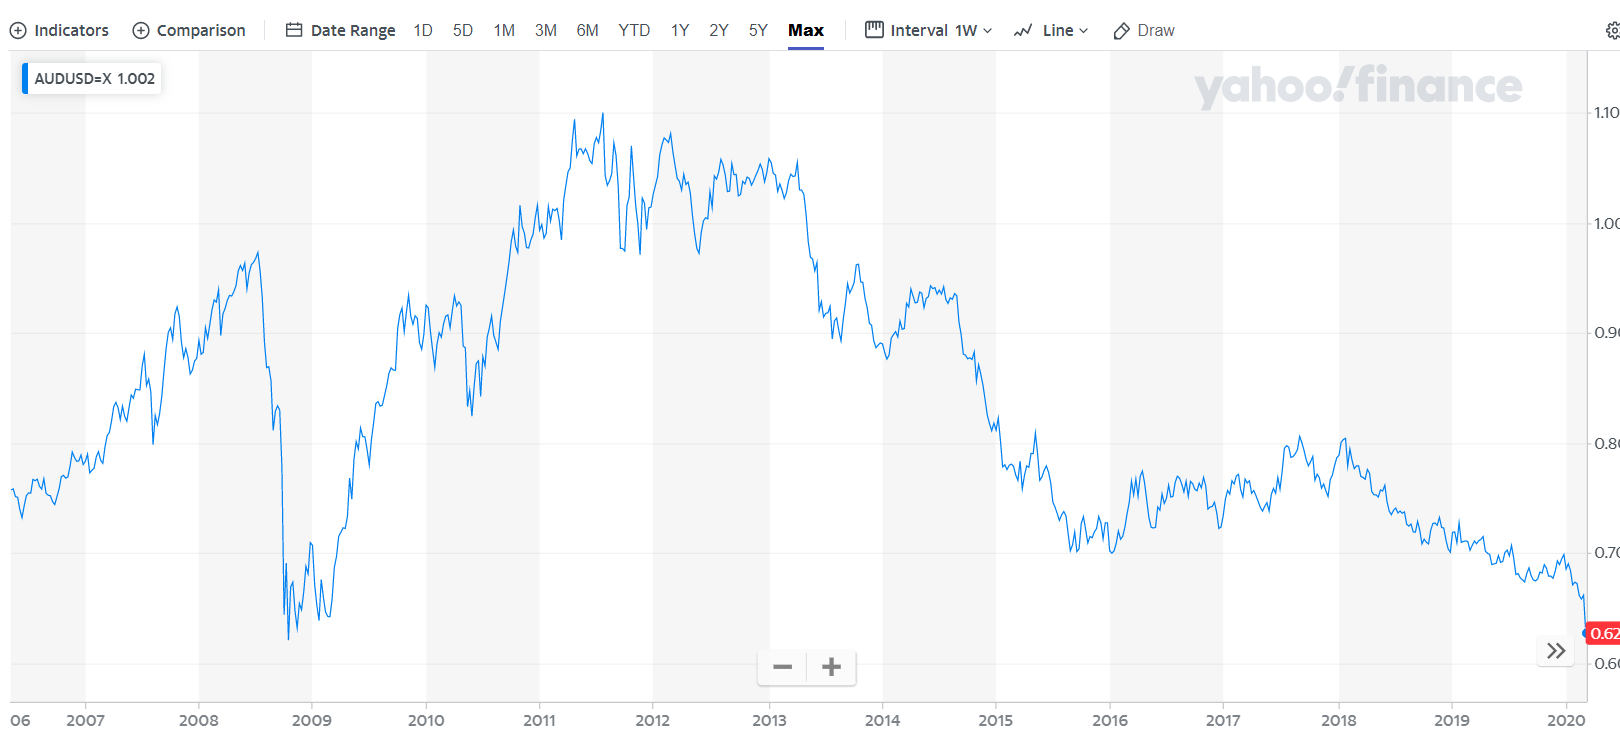 AUDUSD Chart - Yahoo Finance - 13 March 2020